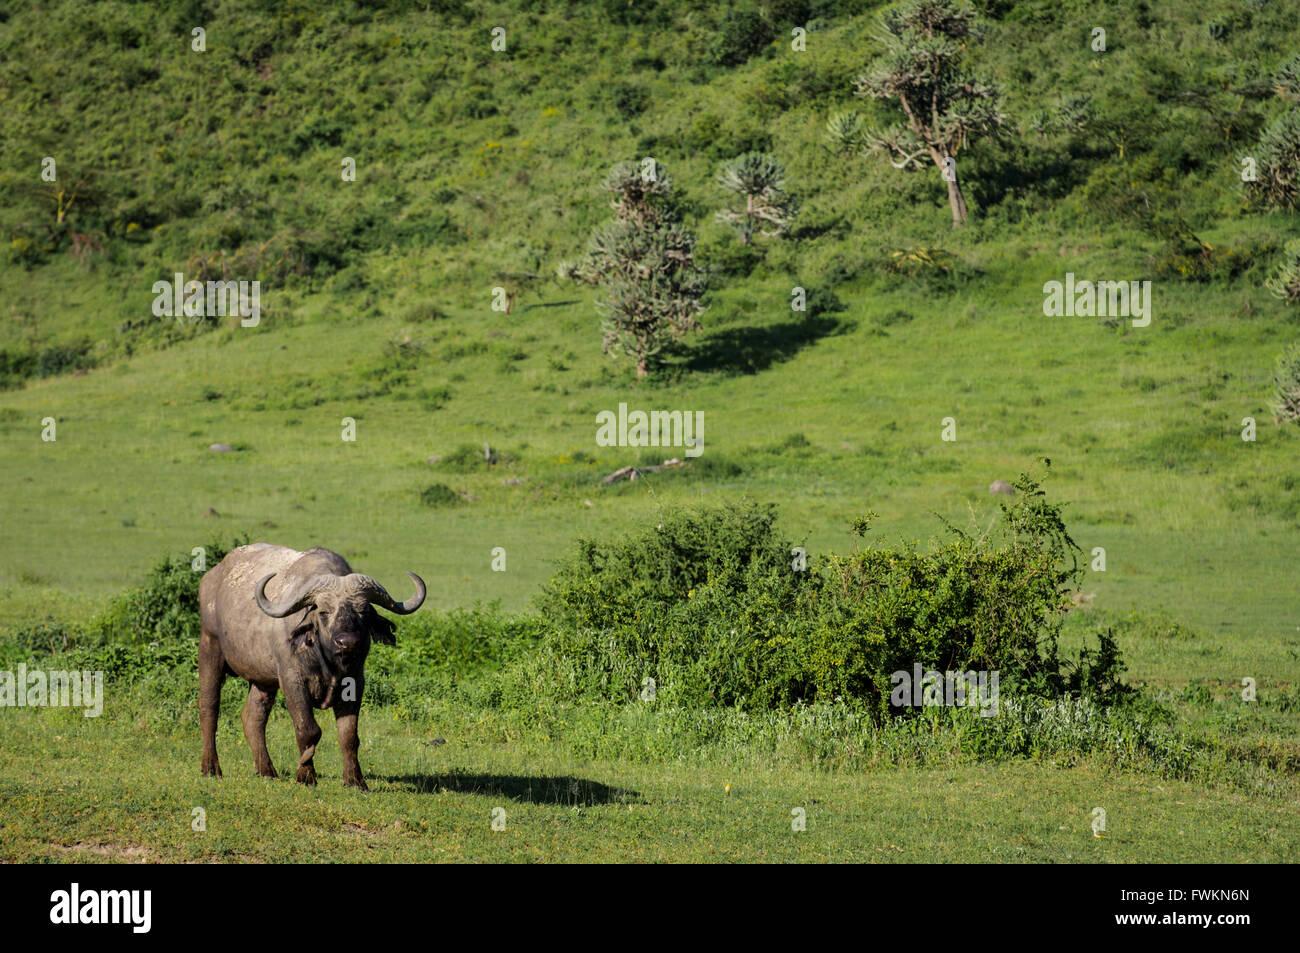 African Buffalo (Syncerus caffer) standing in green grassland near edge of basal plain of Ngorongoro Crater, Tanzania, Stock Photo